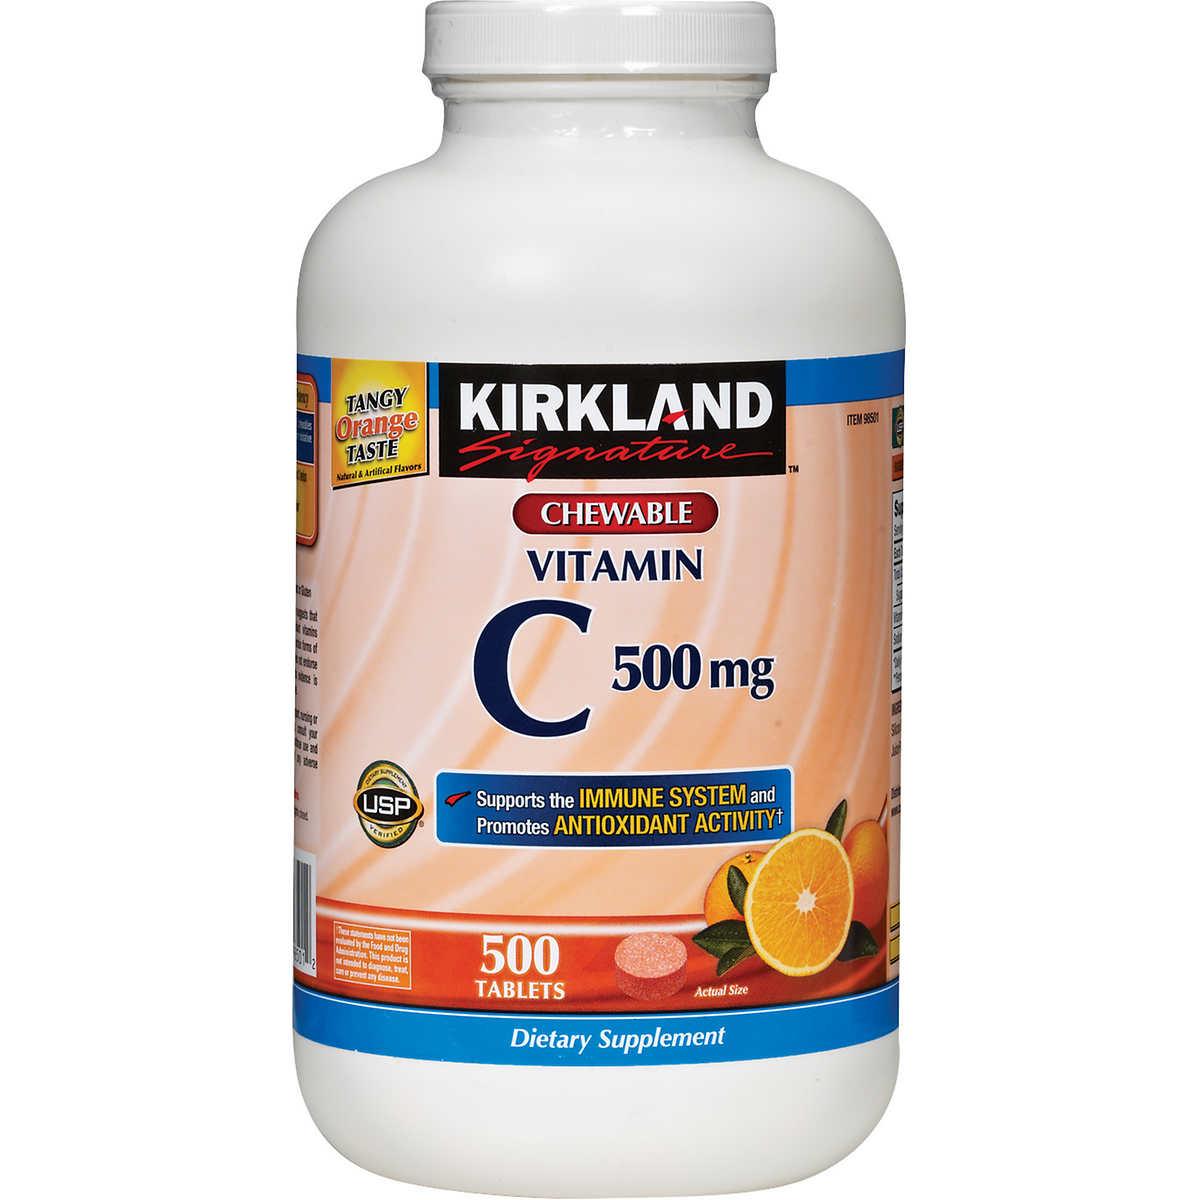 Vitamin C Kirkland 500mg - Viên uống bổ sung Vitamin C